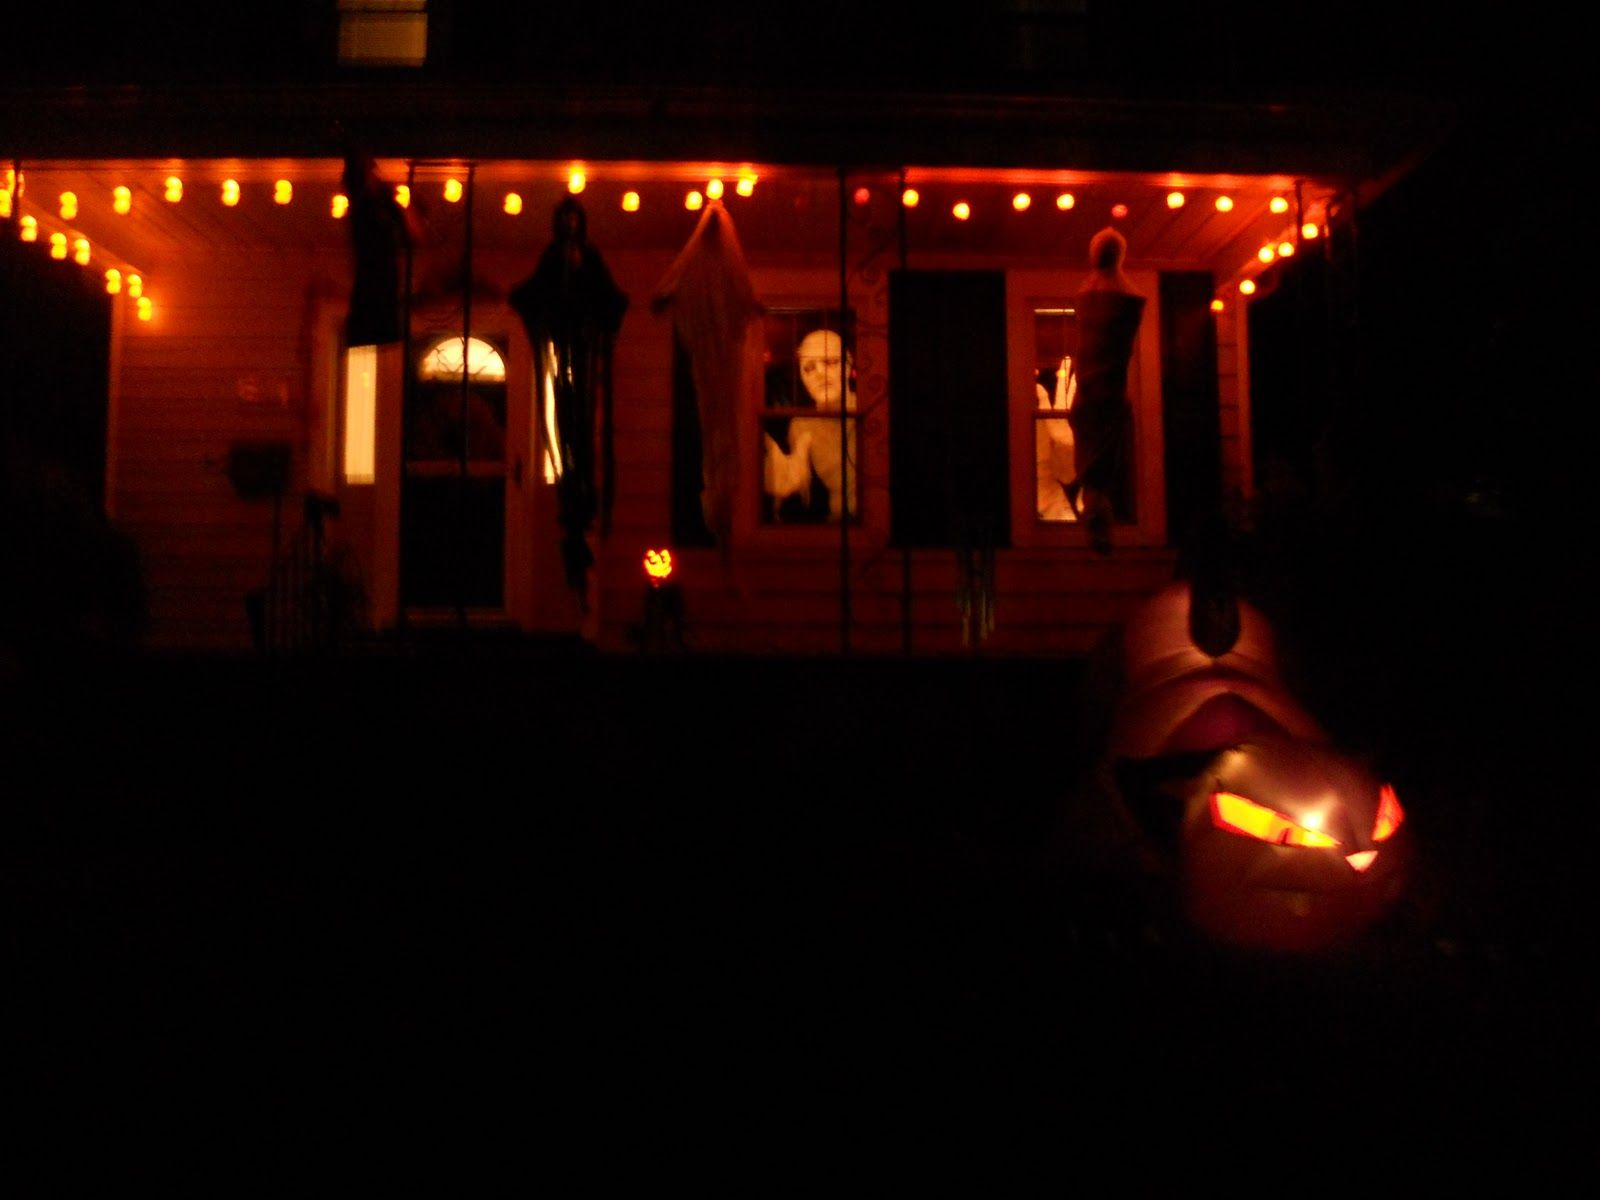 Image Result For Light Up Eyes Halloween Decoration Window Halloween Window Decorations Fun Halloween Decor Halloween Outdoor Decorations